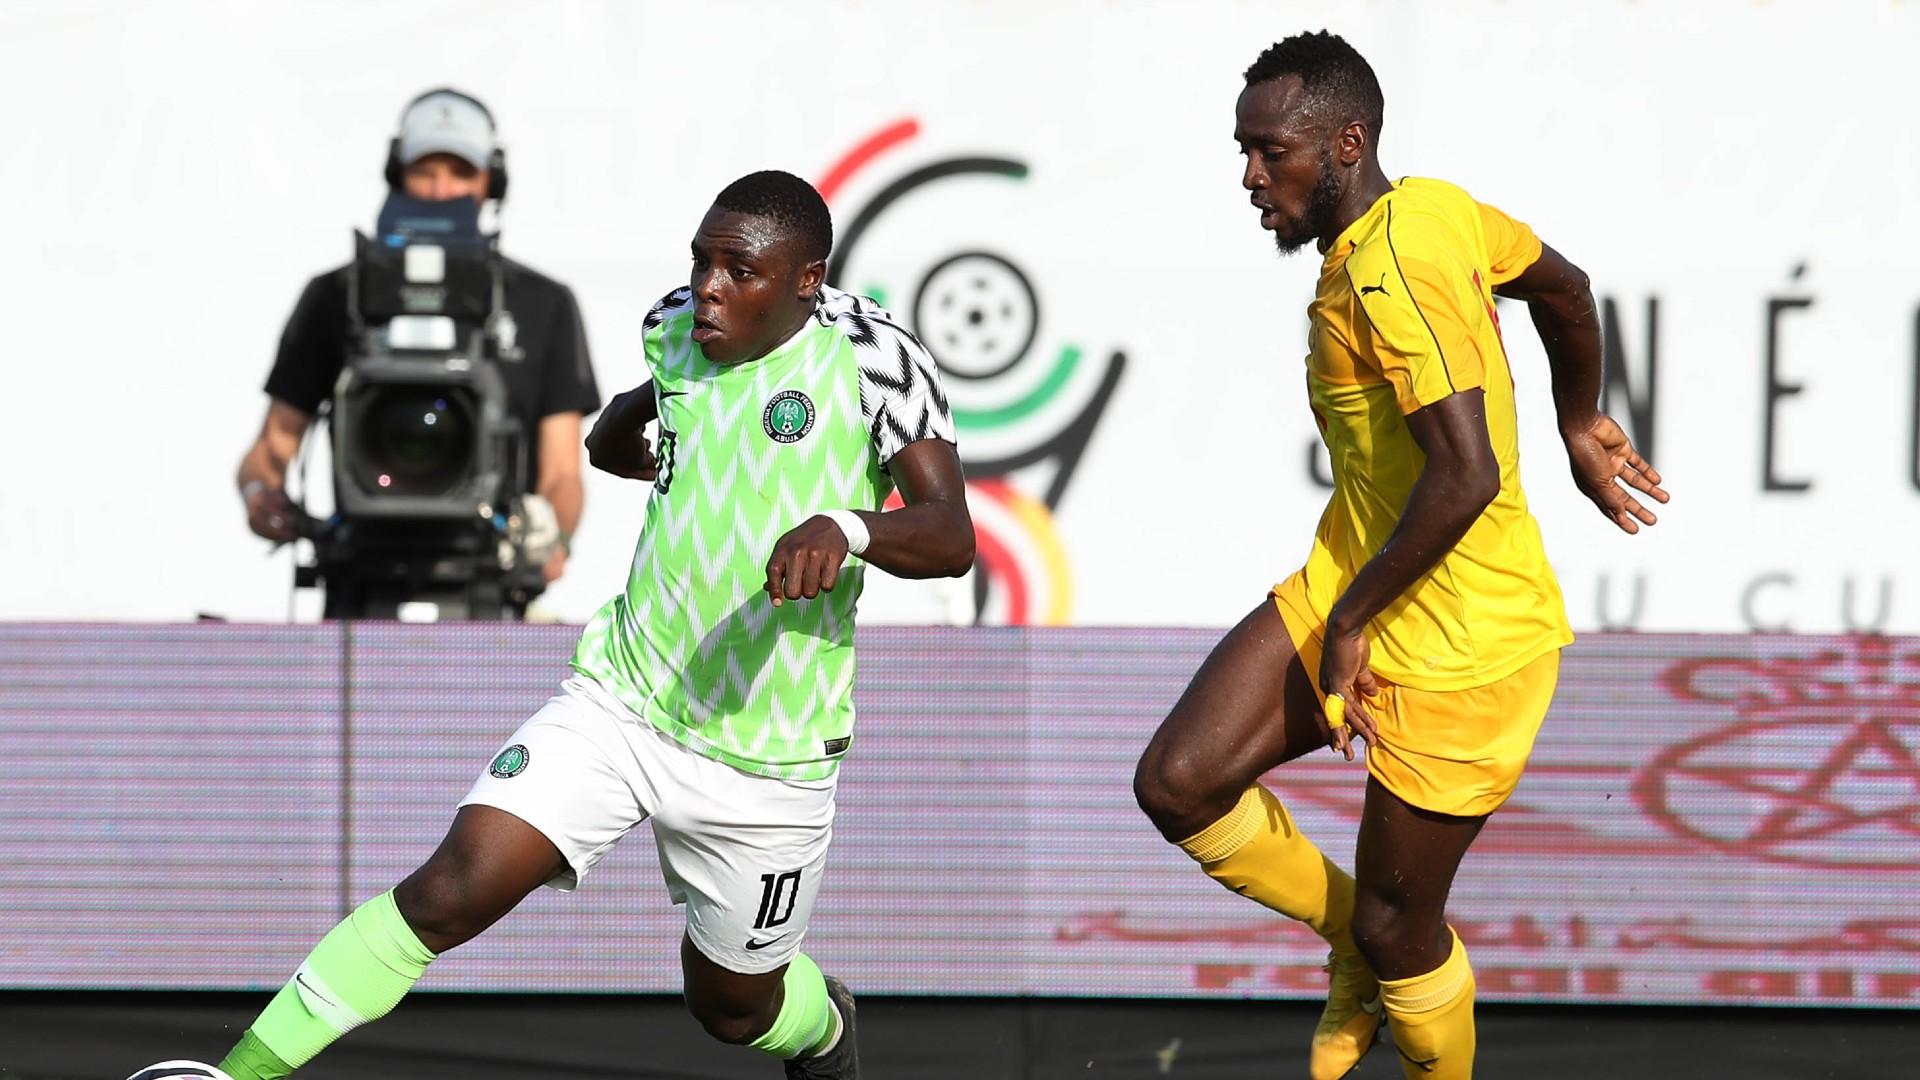 MLS star Ibrahim Sunusi invited to Nigeria squad for Mexico friendly